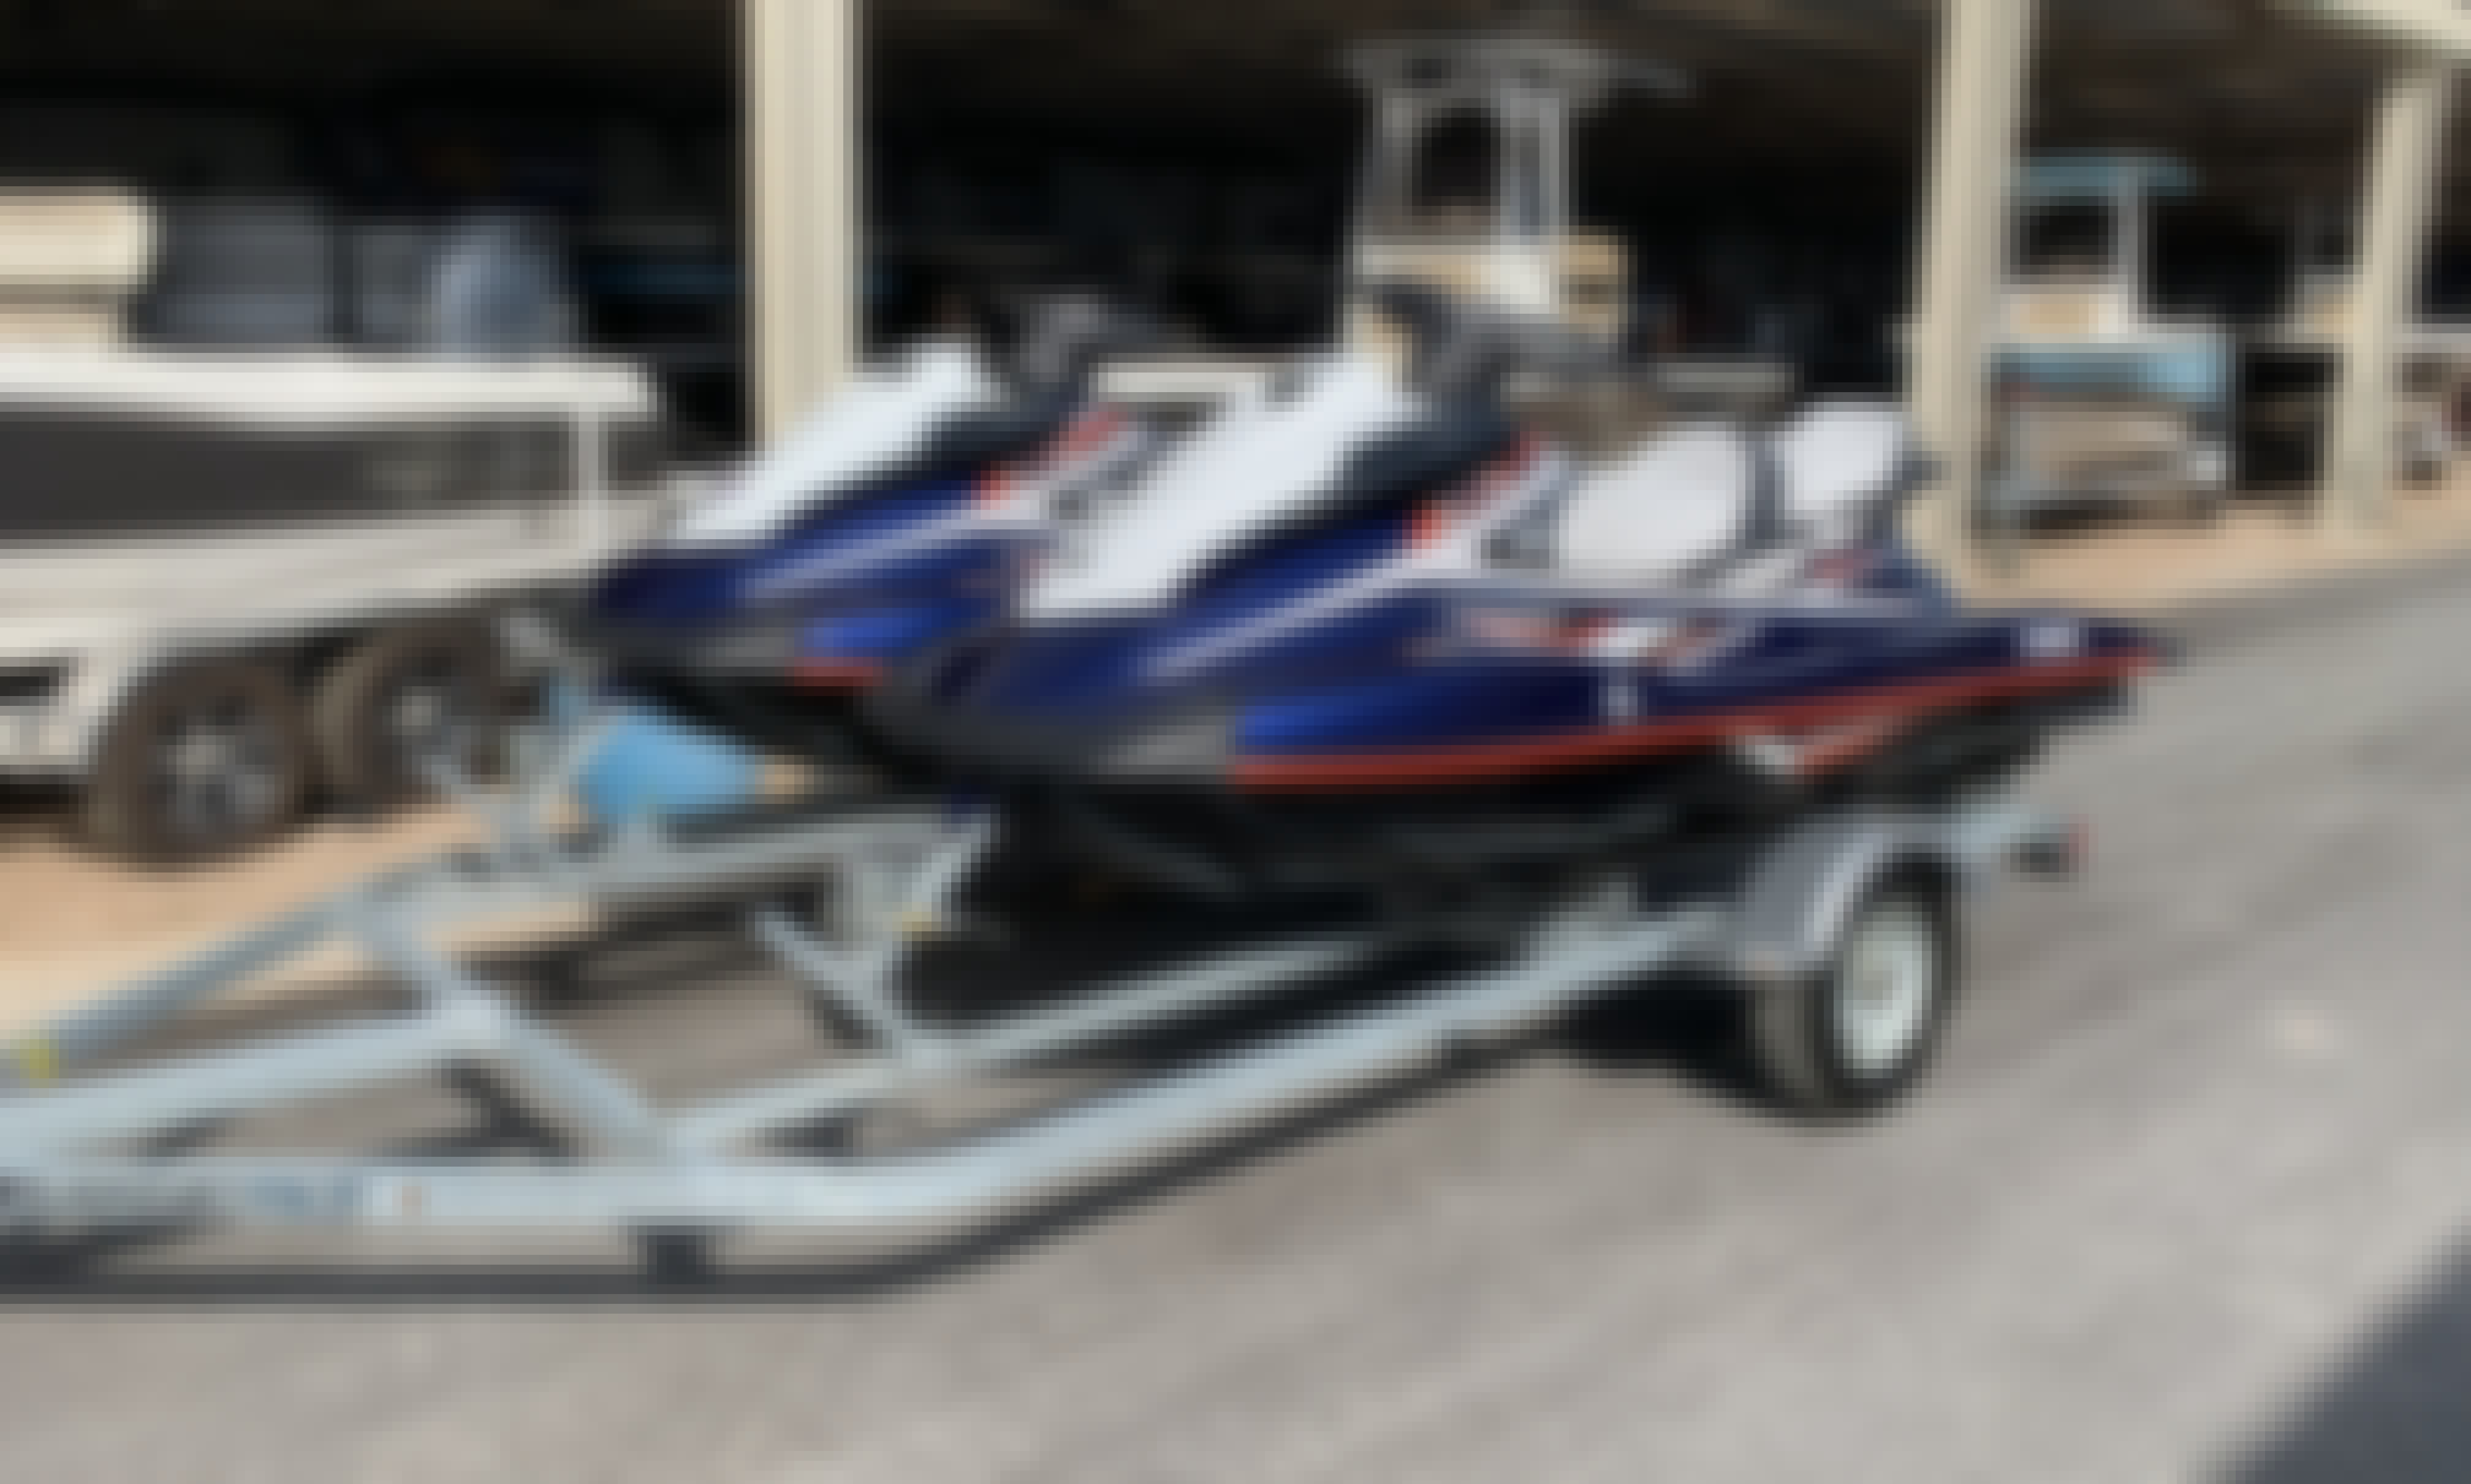 2019 Yamaha VX Cruisers Rental in Jonestown, Texas